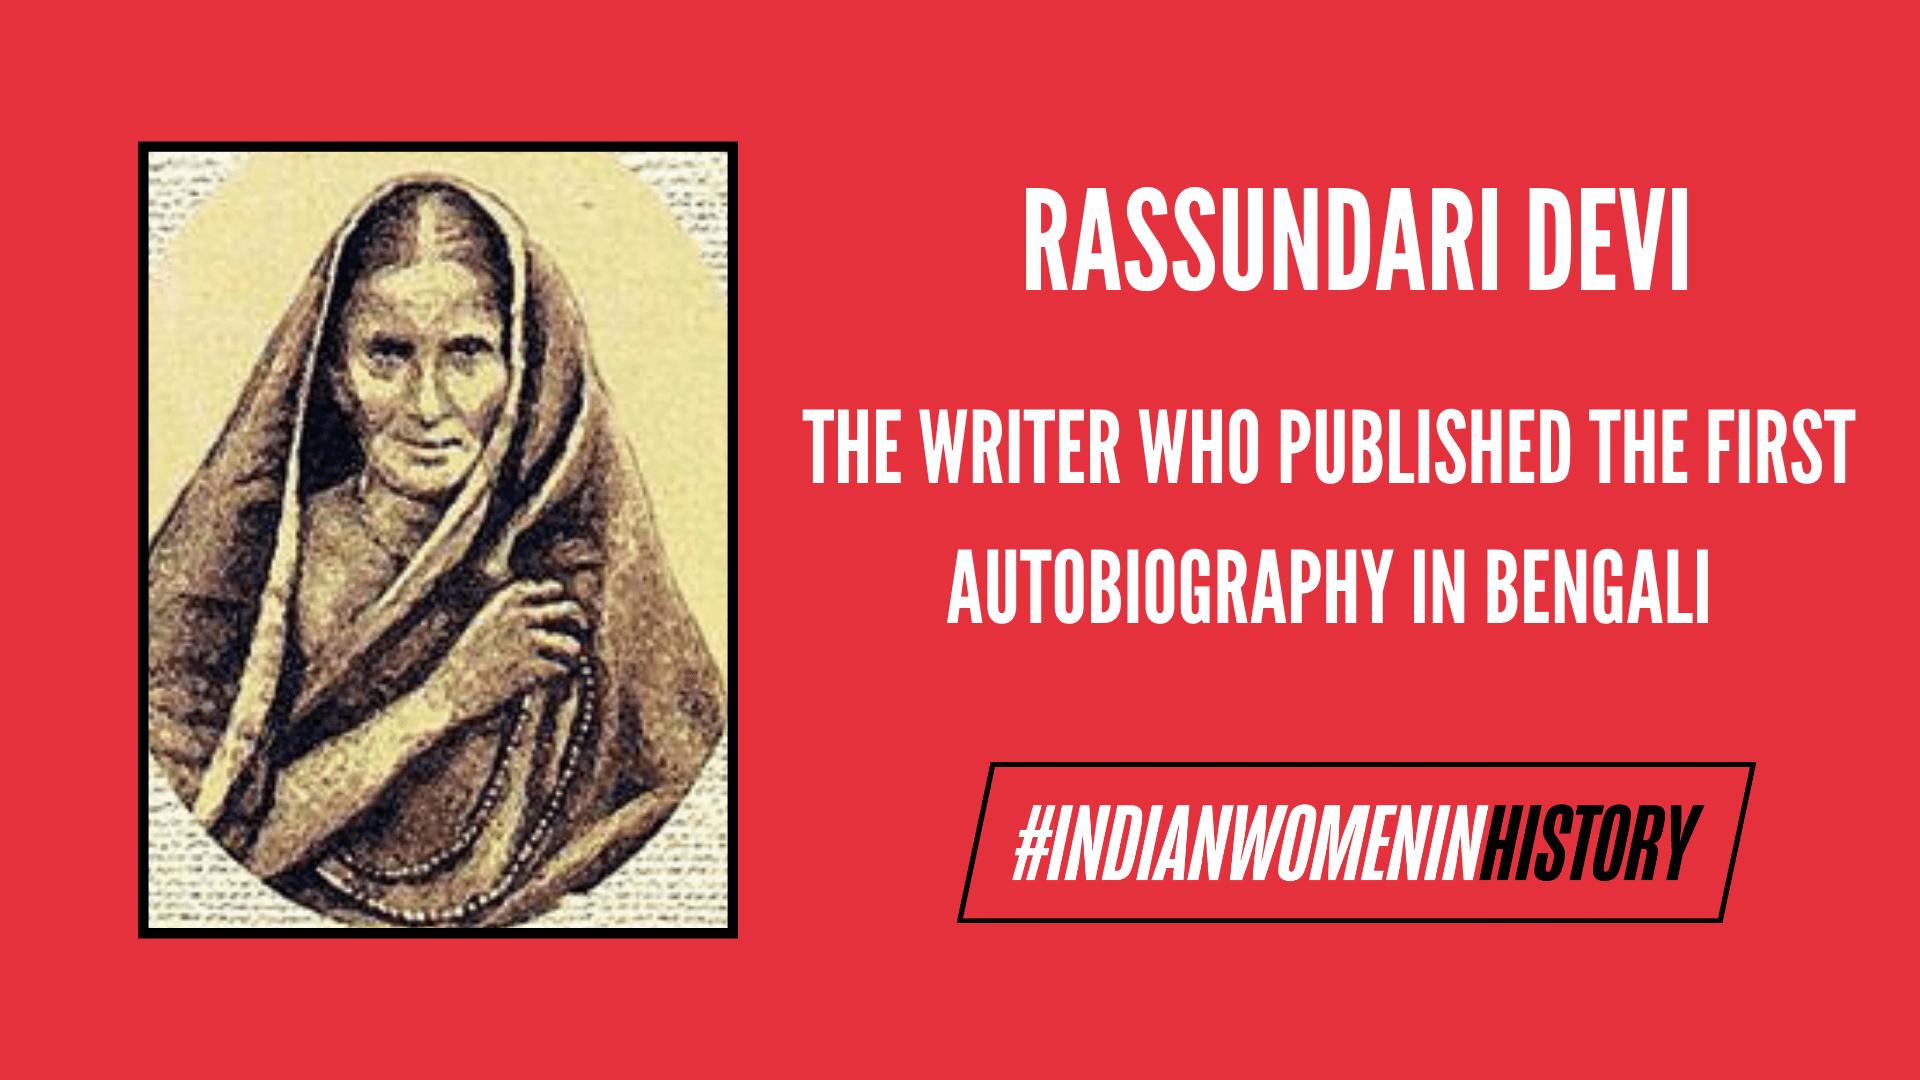 The Caged Bird Who Sang: The Life and Writing of Rassundari Devi | #IndianWomenInHistory